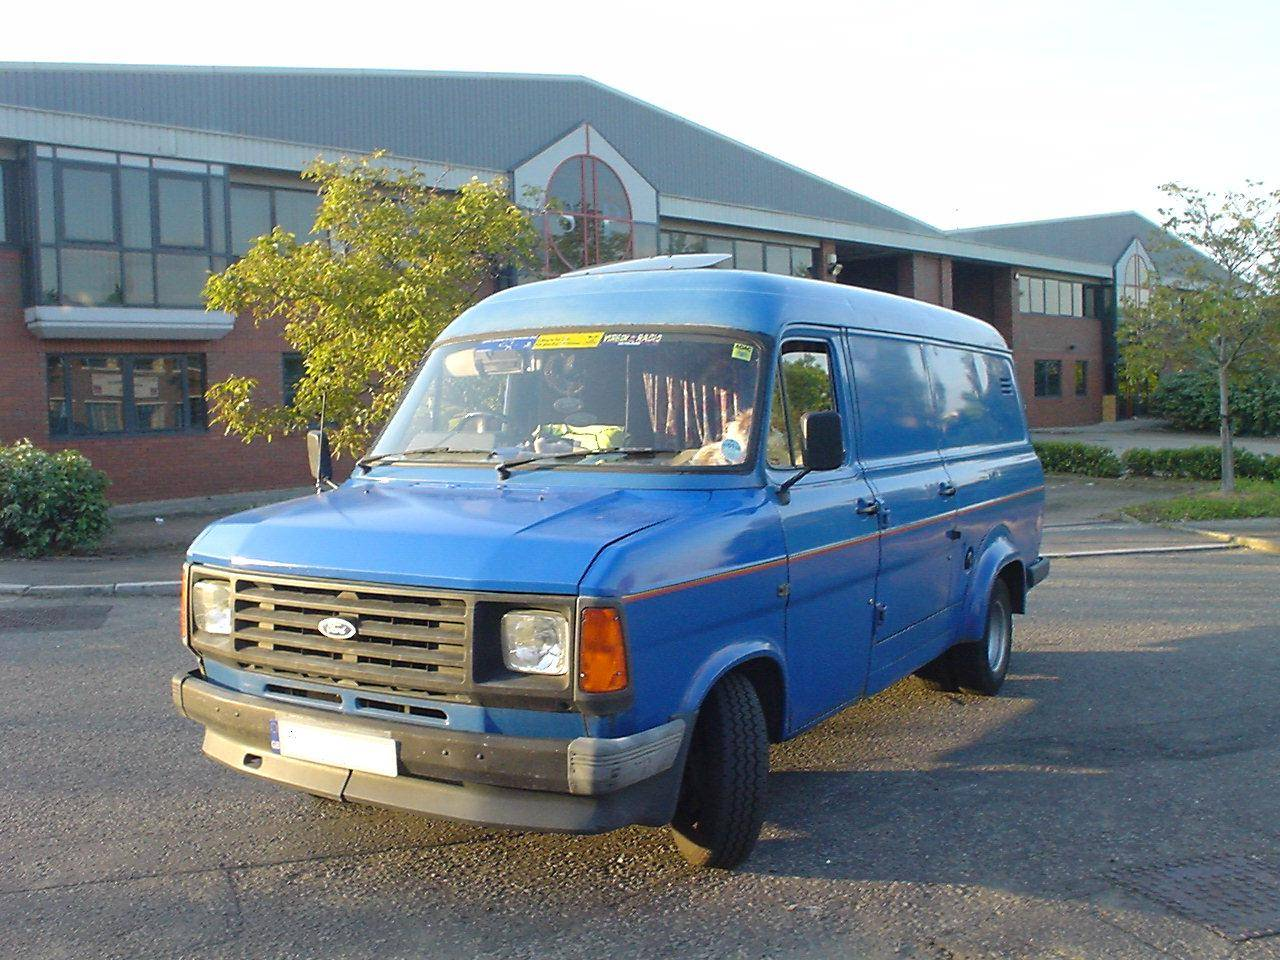 1980s long wheelbase panel van